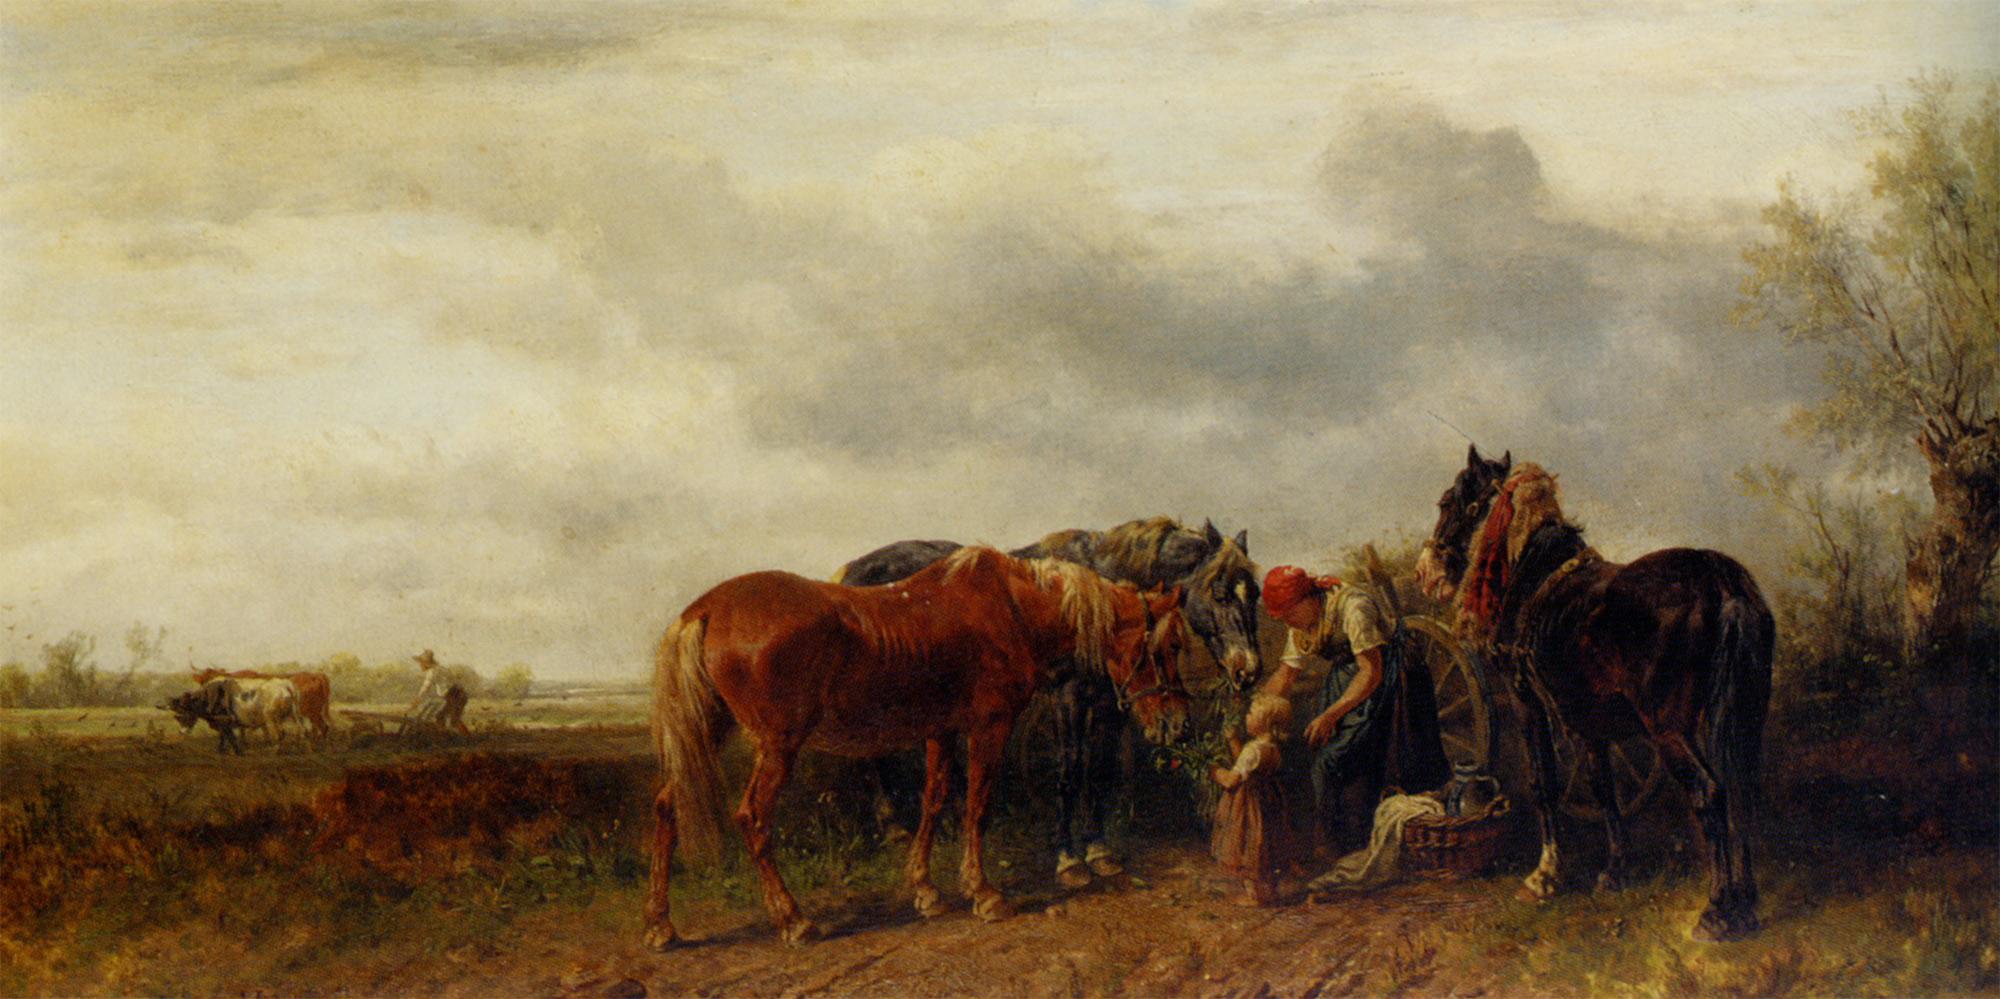 Rest from the work  :: Ludwig Hartmann  - Village life ôîòî